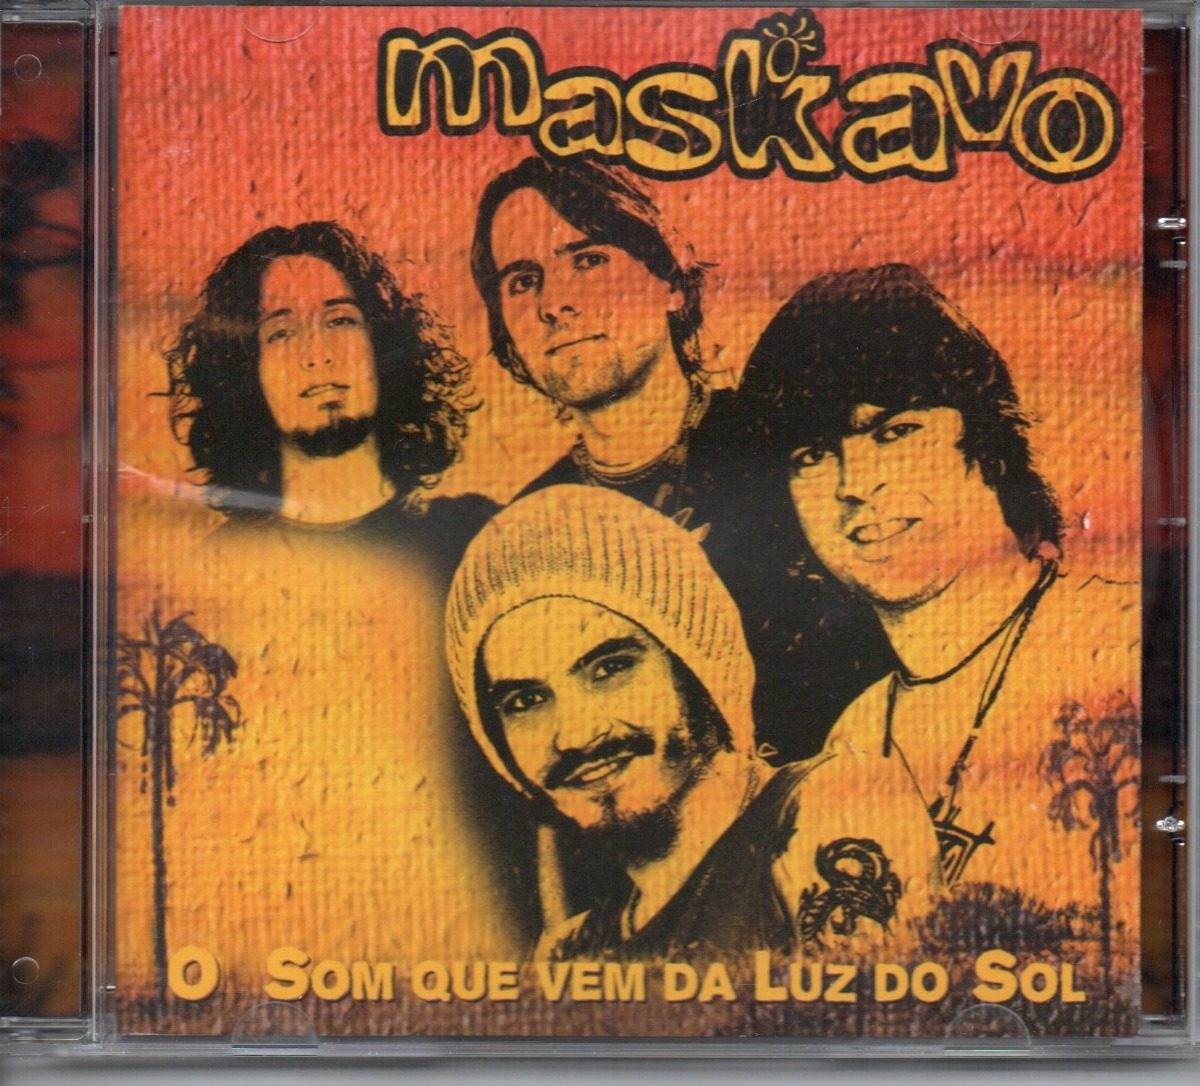 cds maskavo